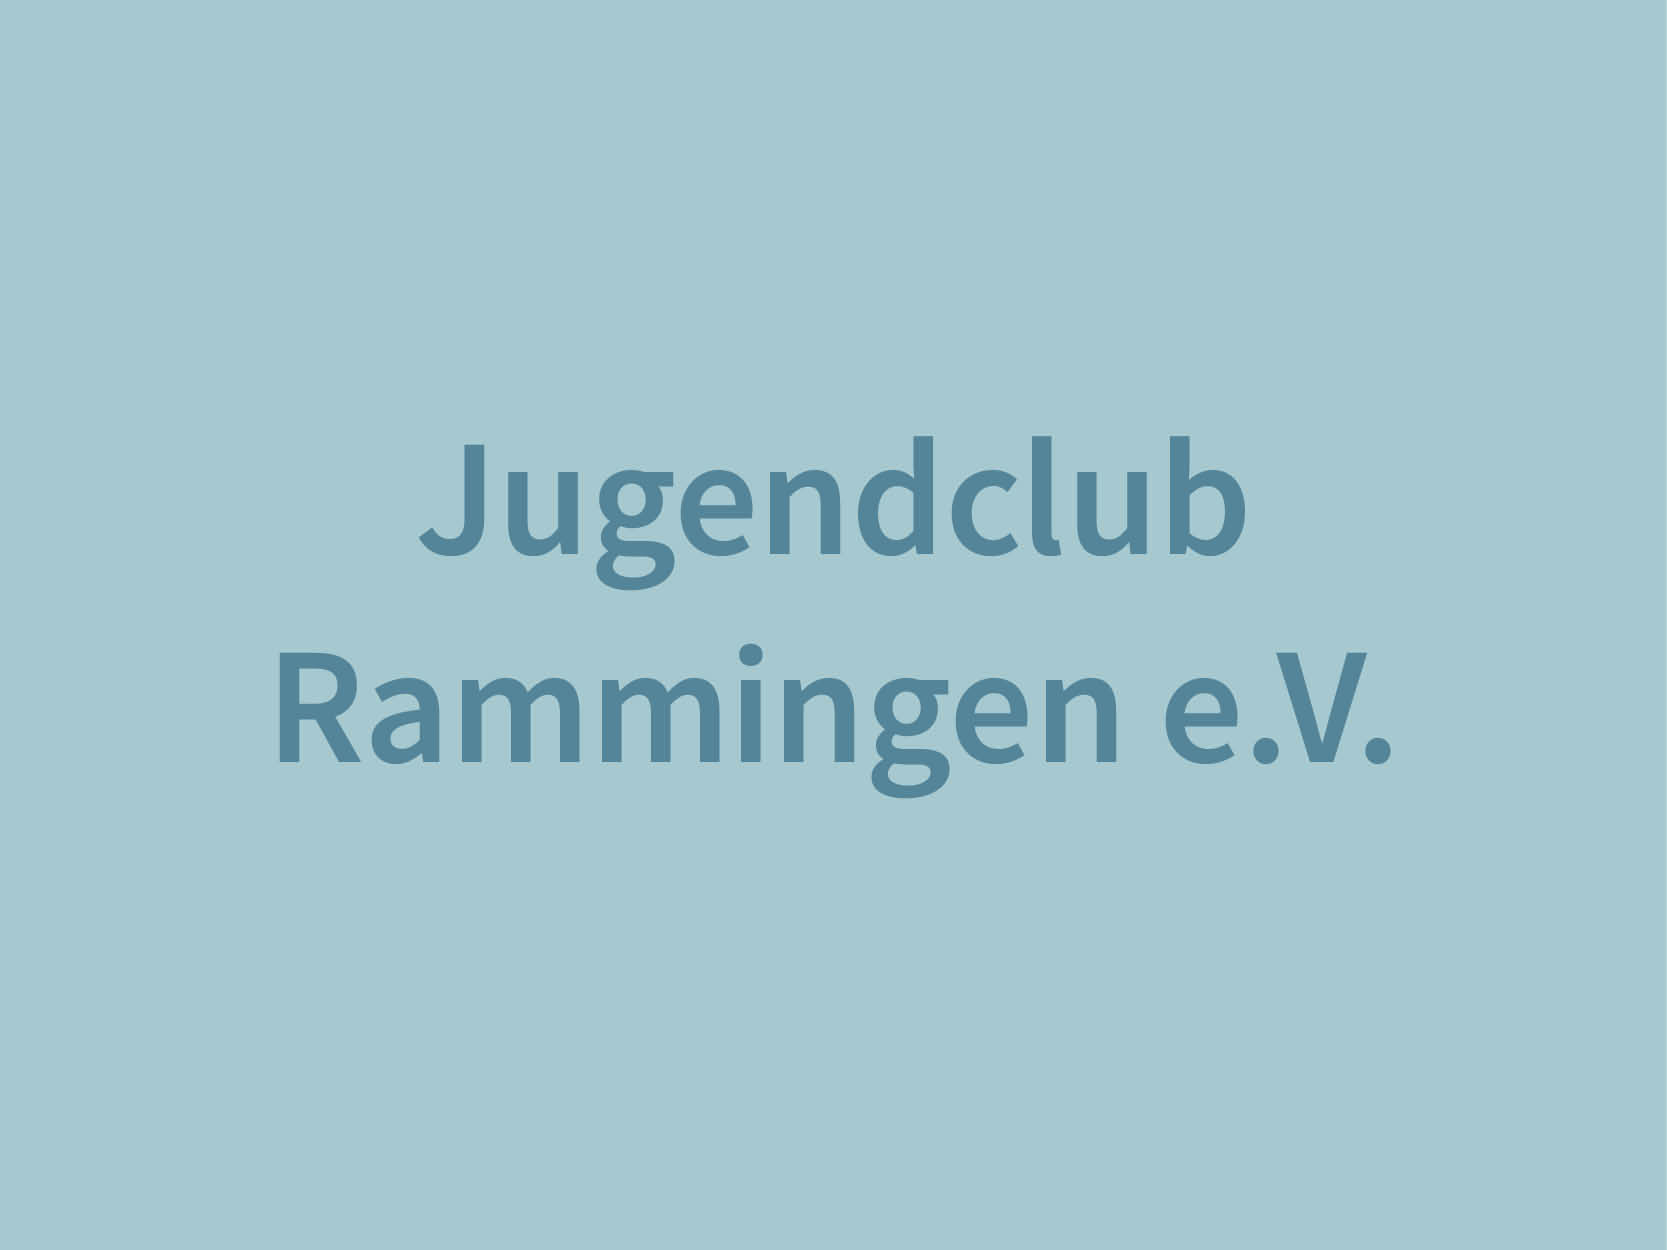 Jugendclub Rammingen e.V.